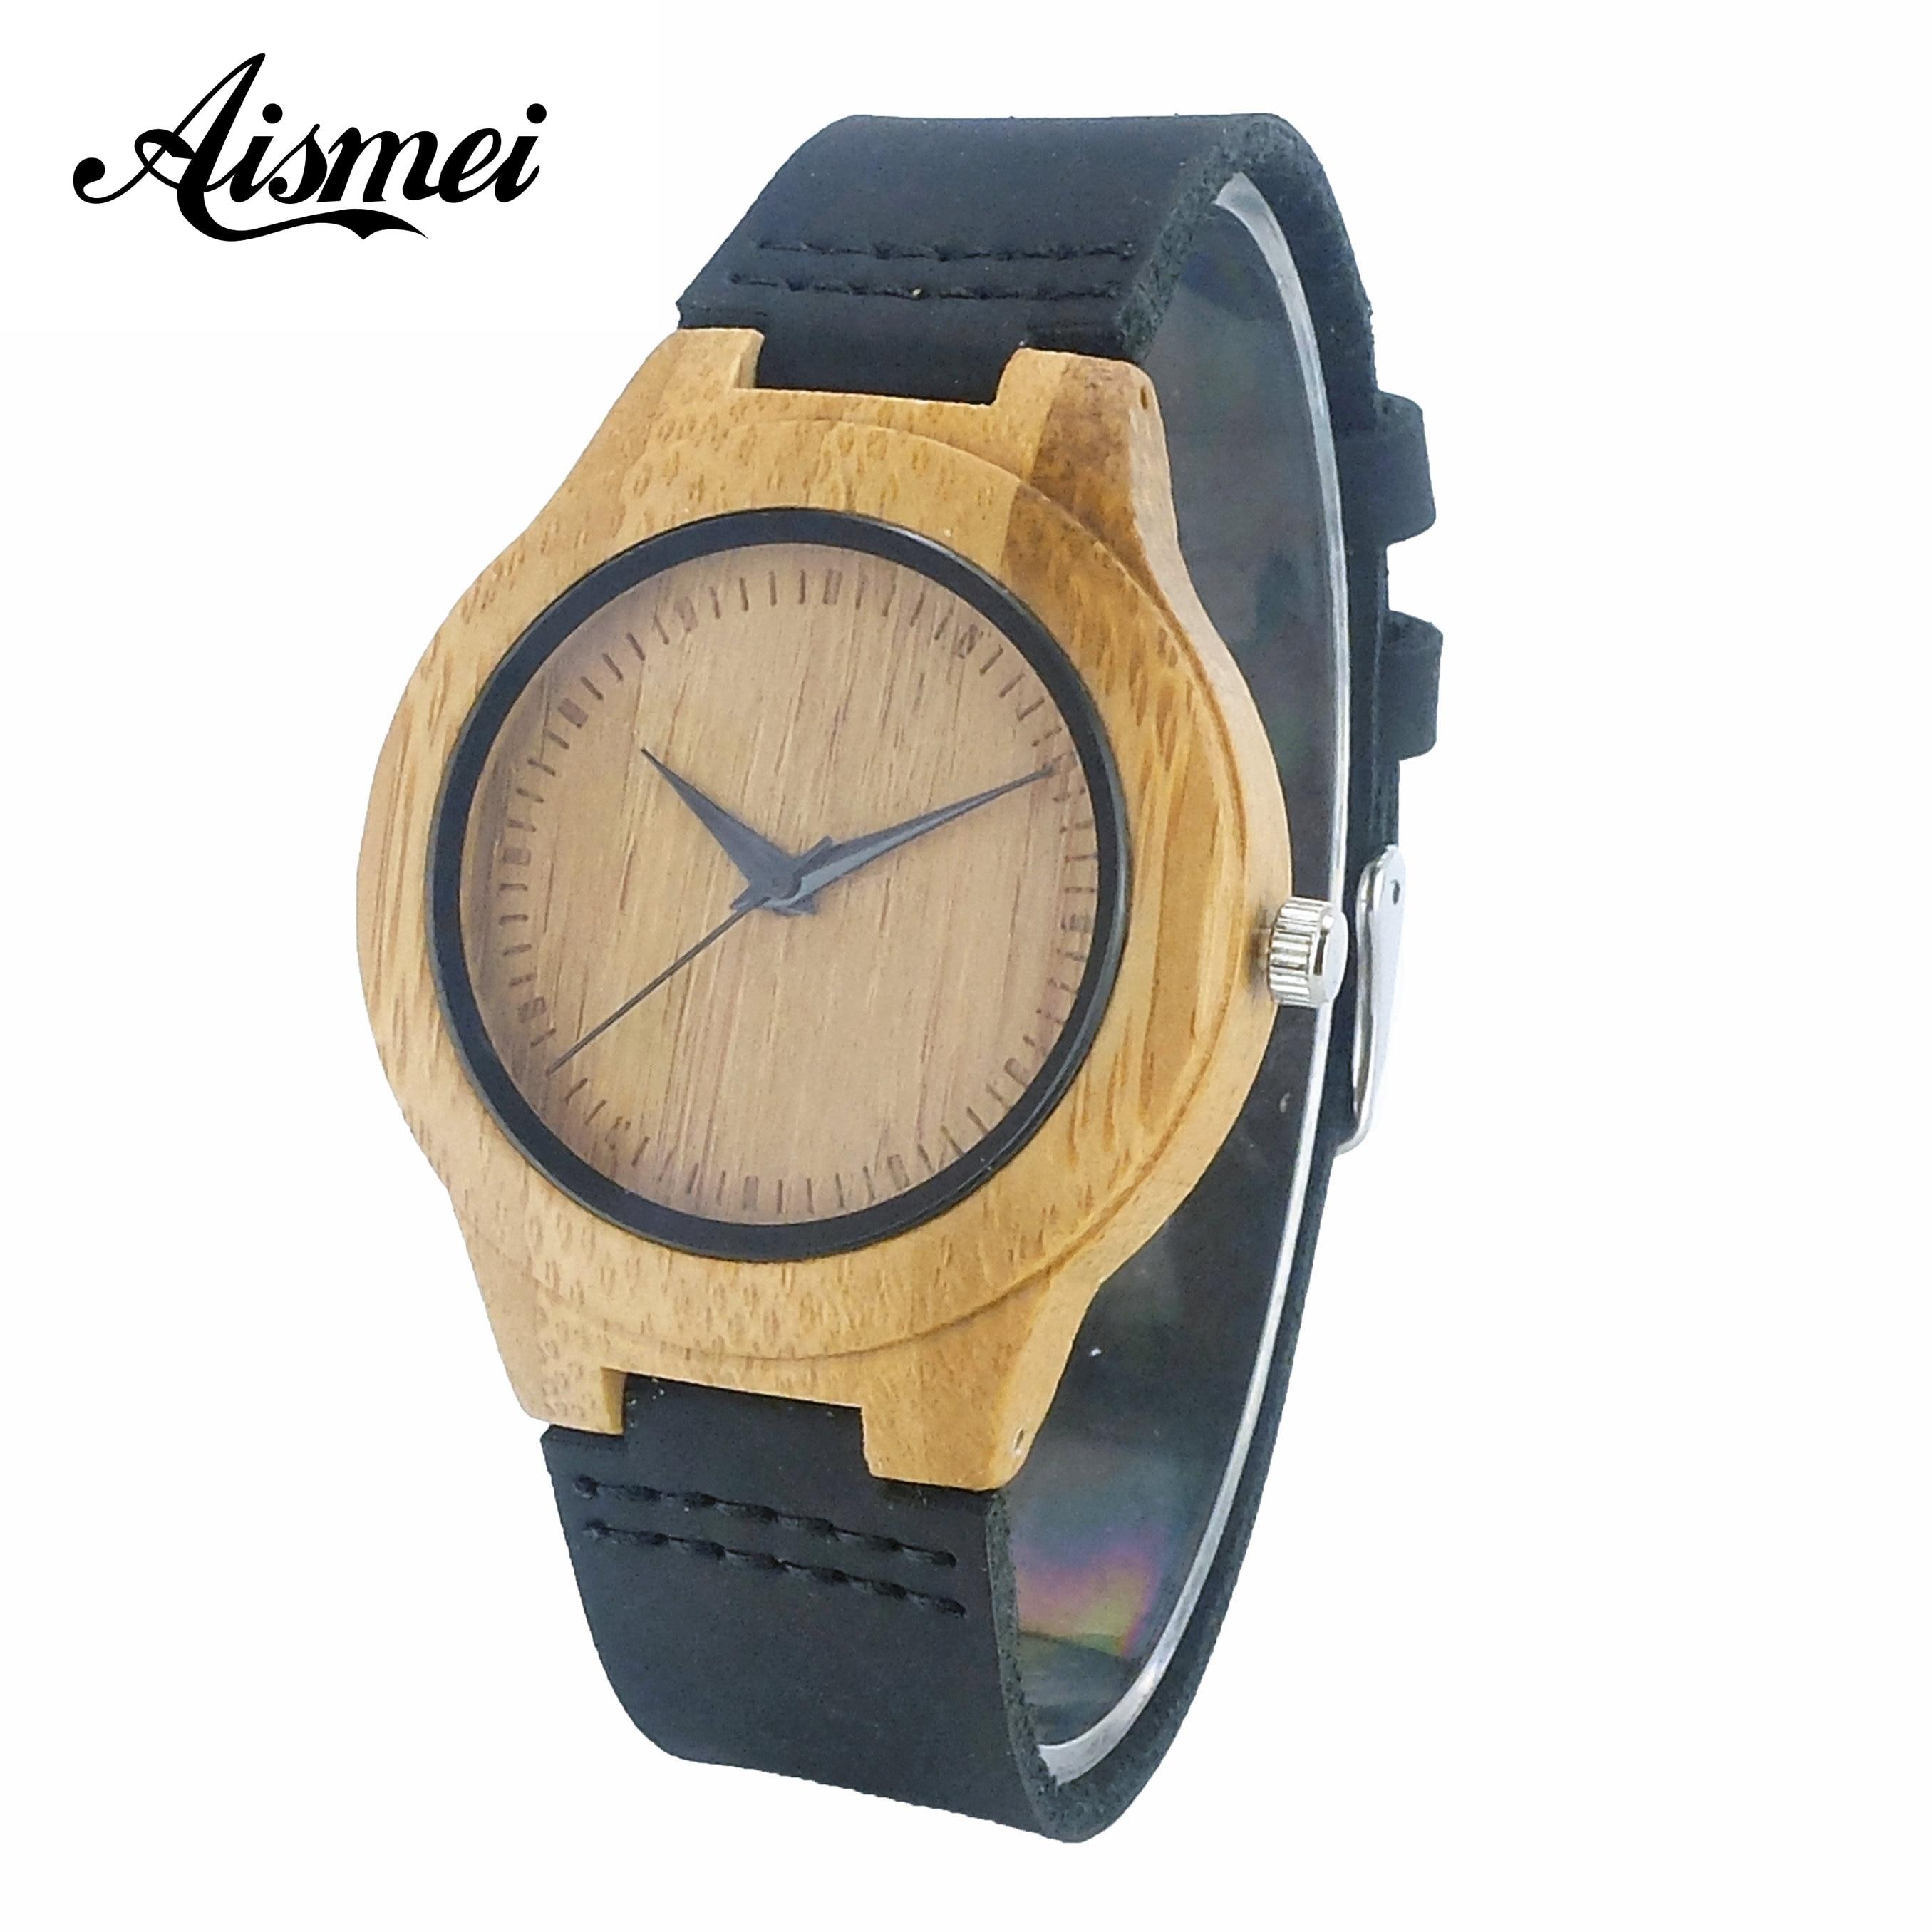 2017 Top Brand Wood Women Quartz Watch Lady Luxury Fashion Dress Clock Classic Wooden Female Wristwatch Gift relogio feminino